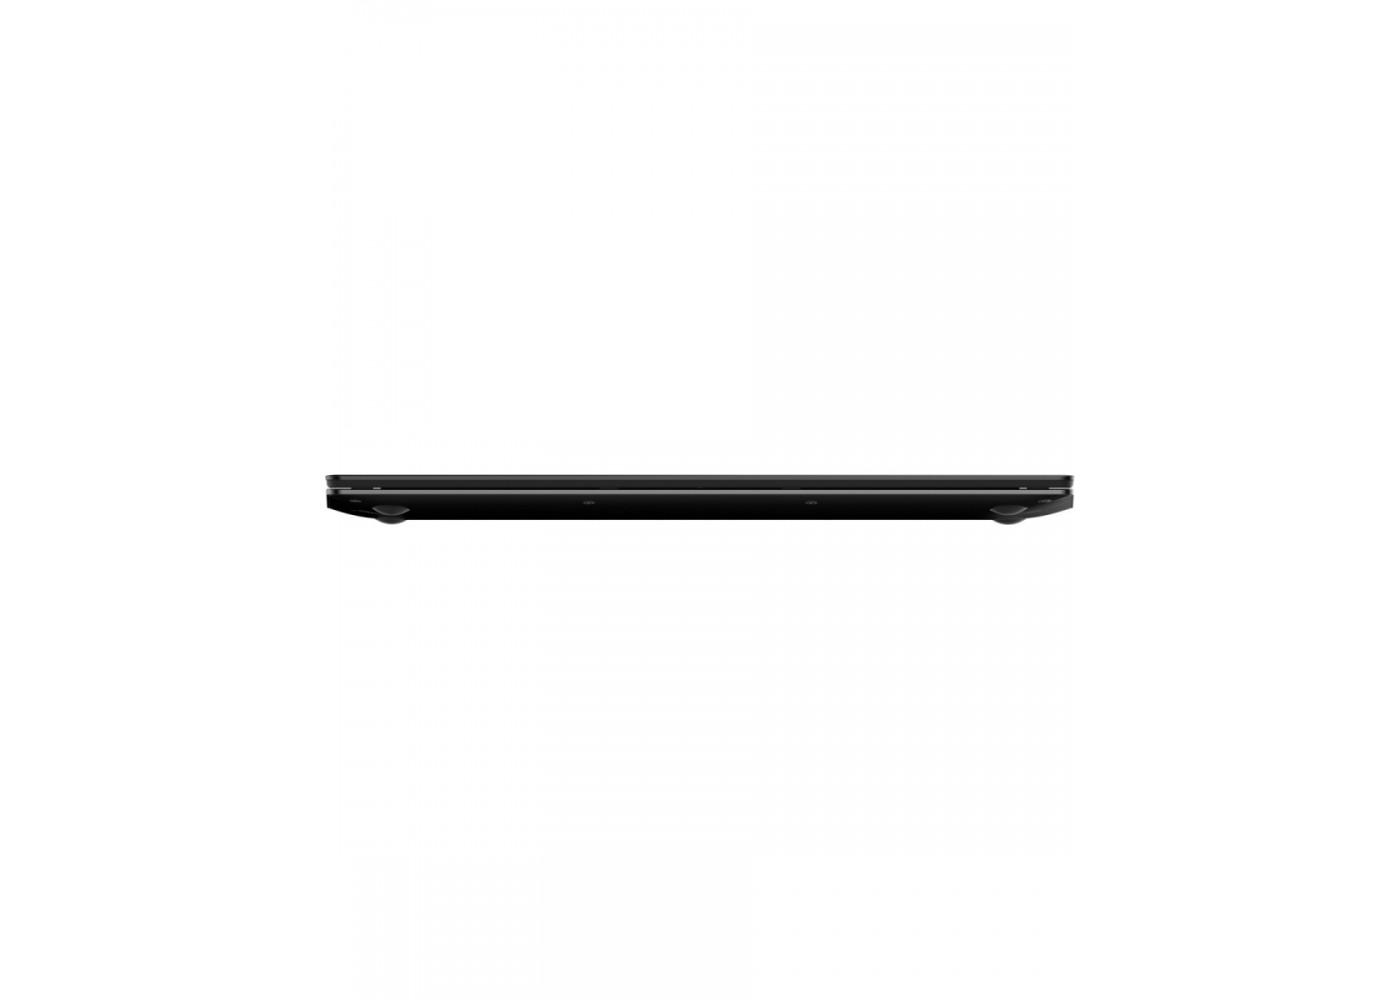 Ноутбук NB285